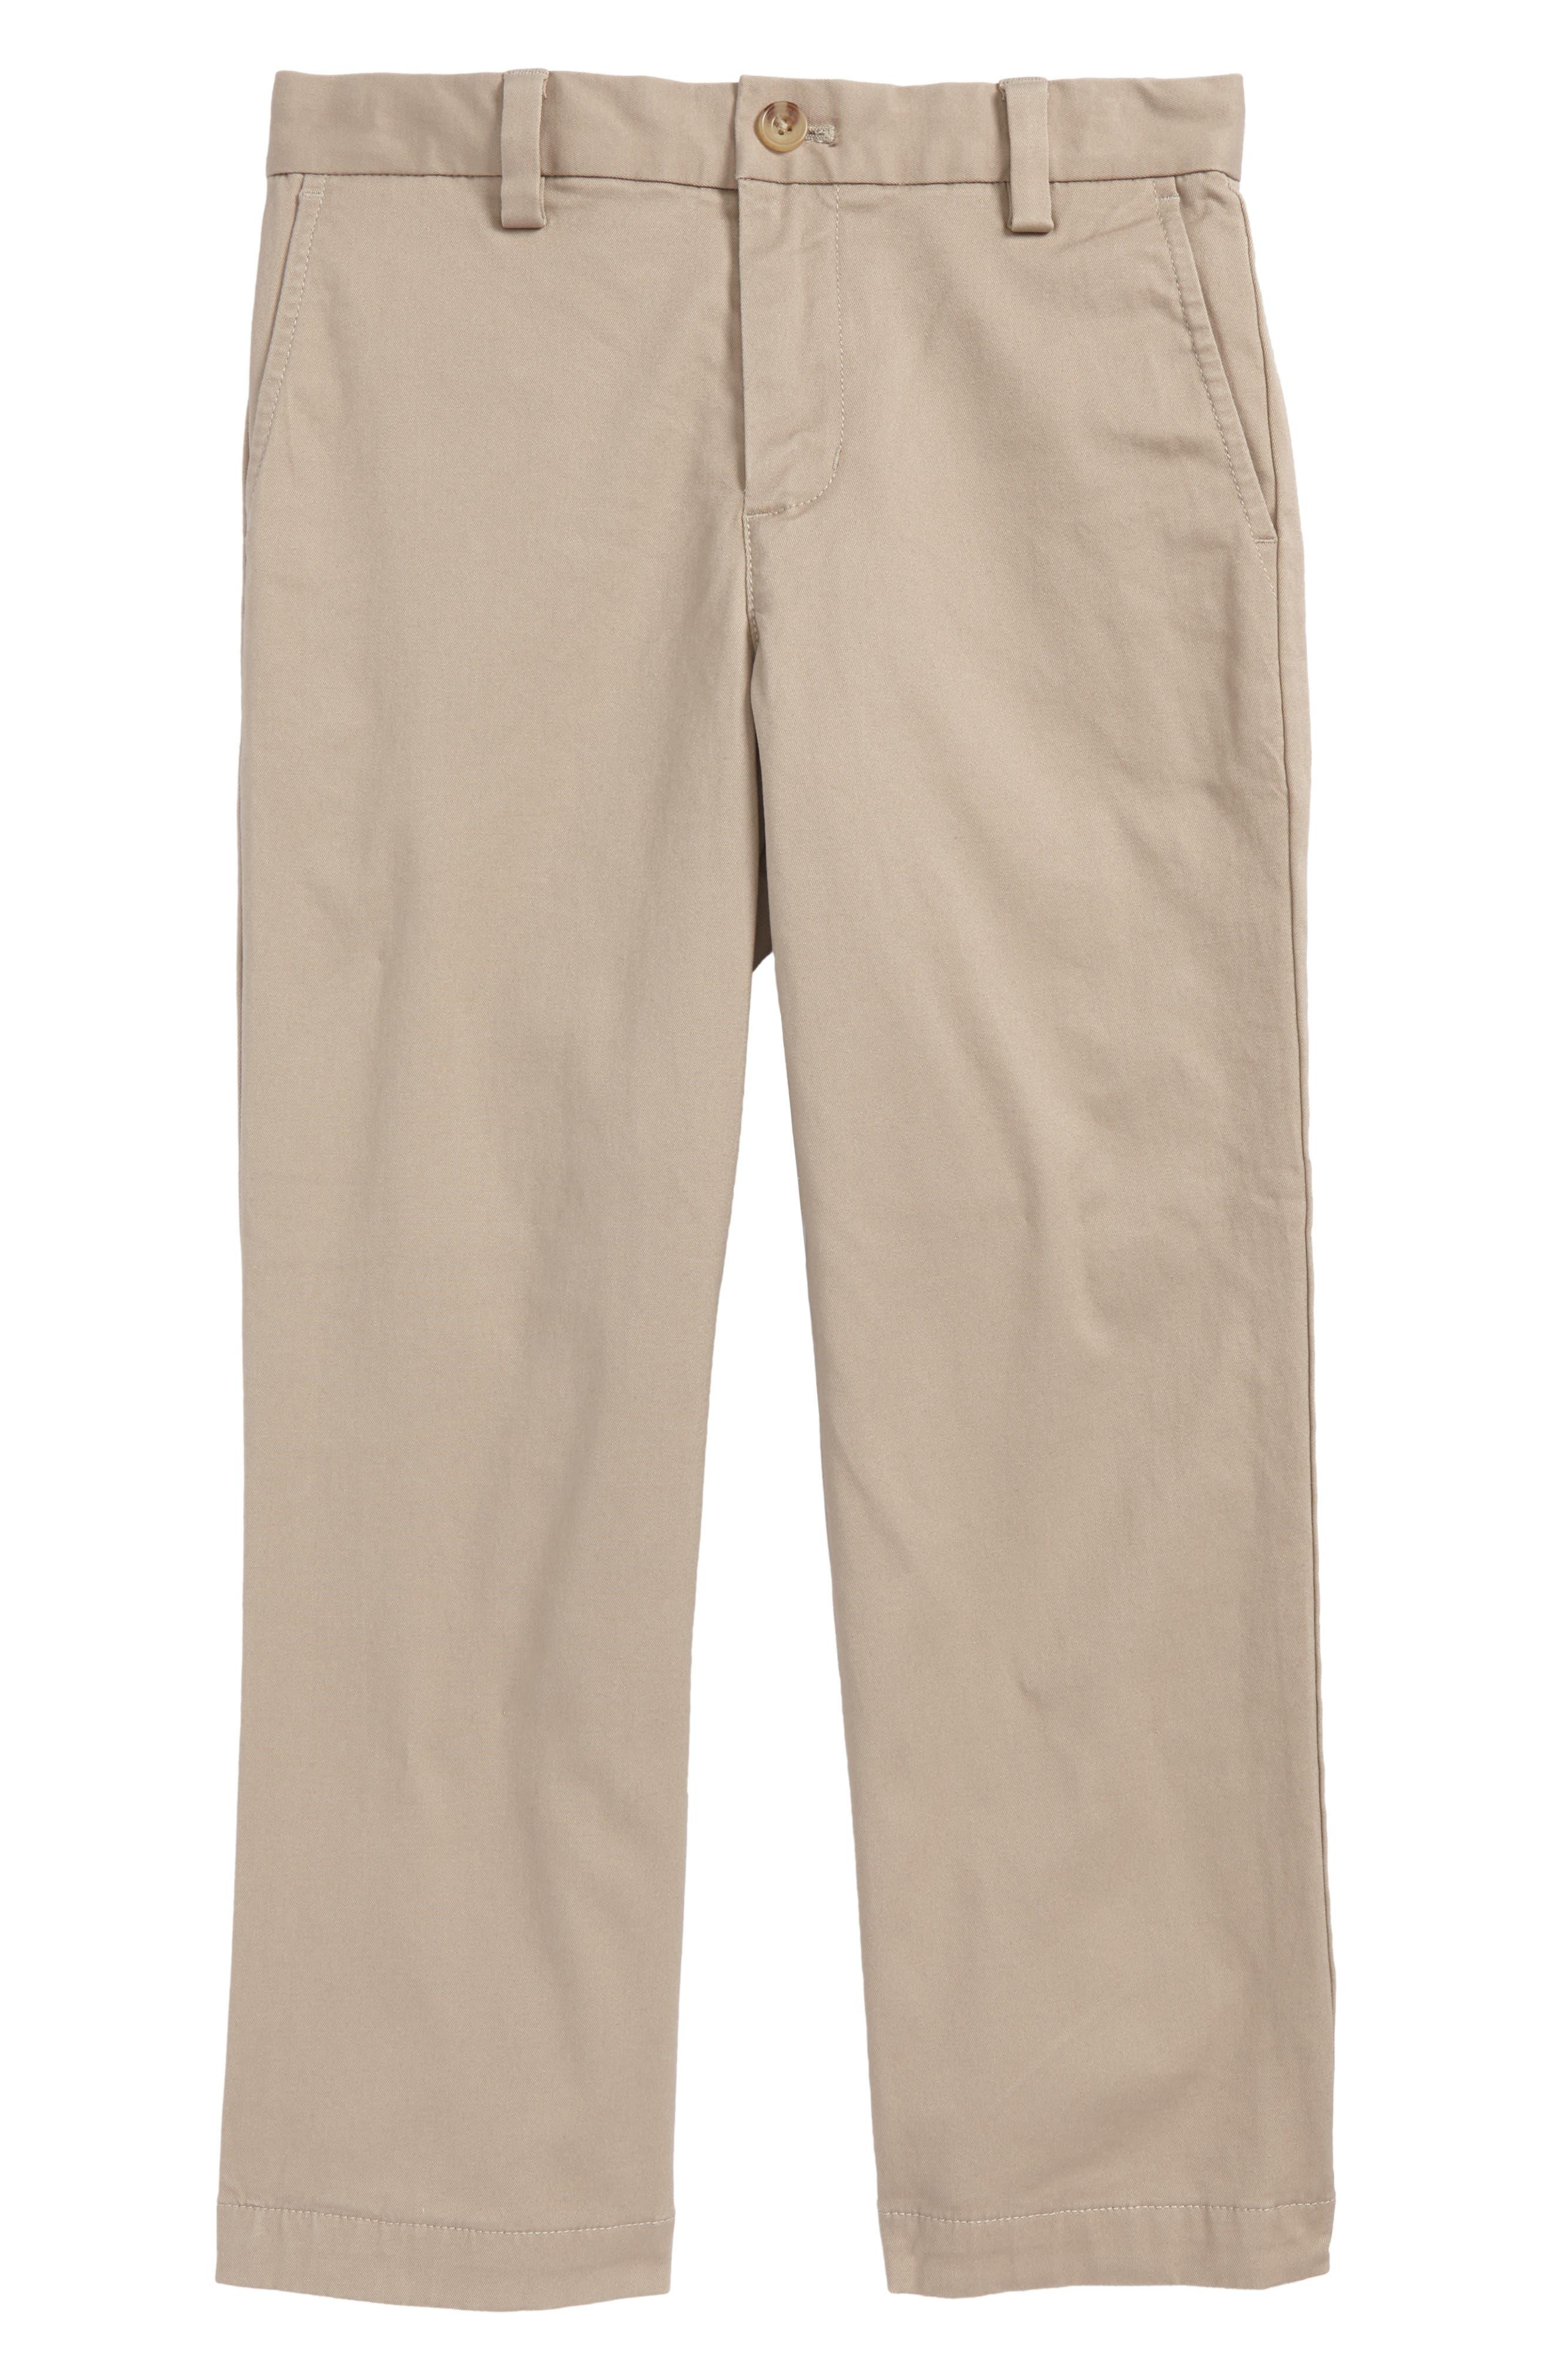 Main Image - vineyard vines Breaker Flannel Lined Pants (Toddler Boys & Little Boys)